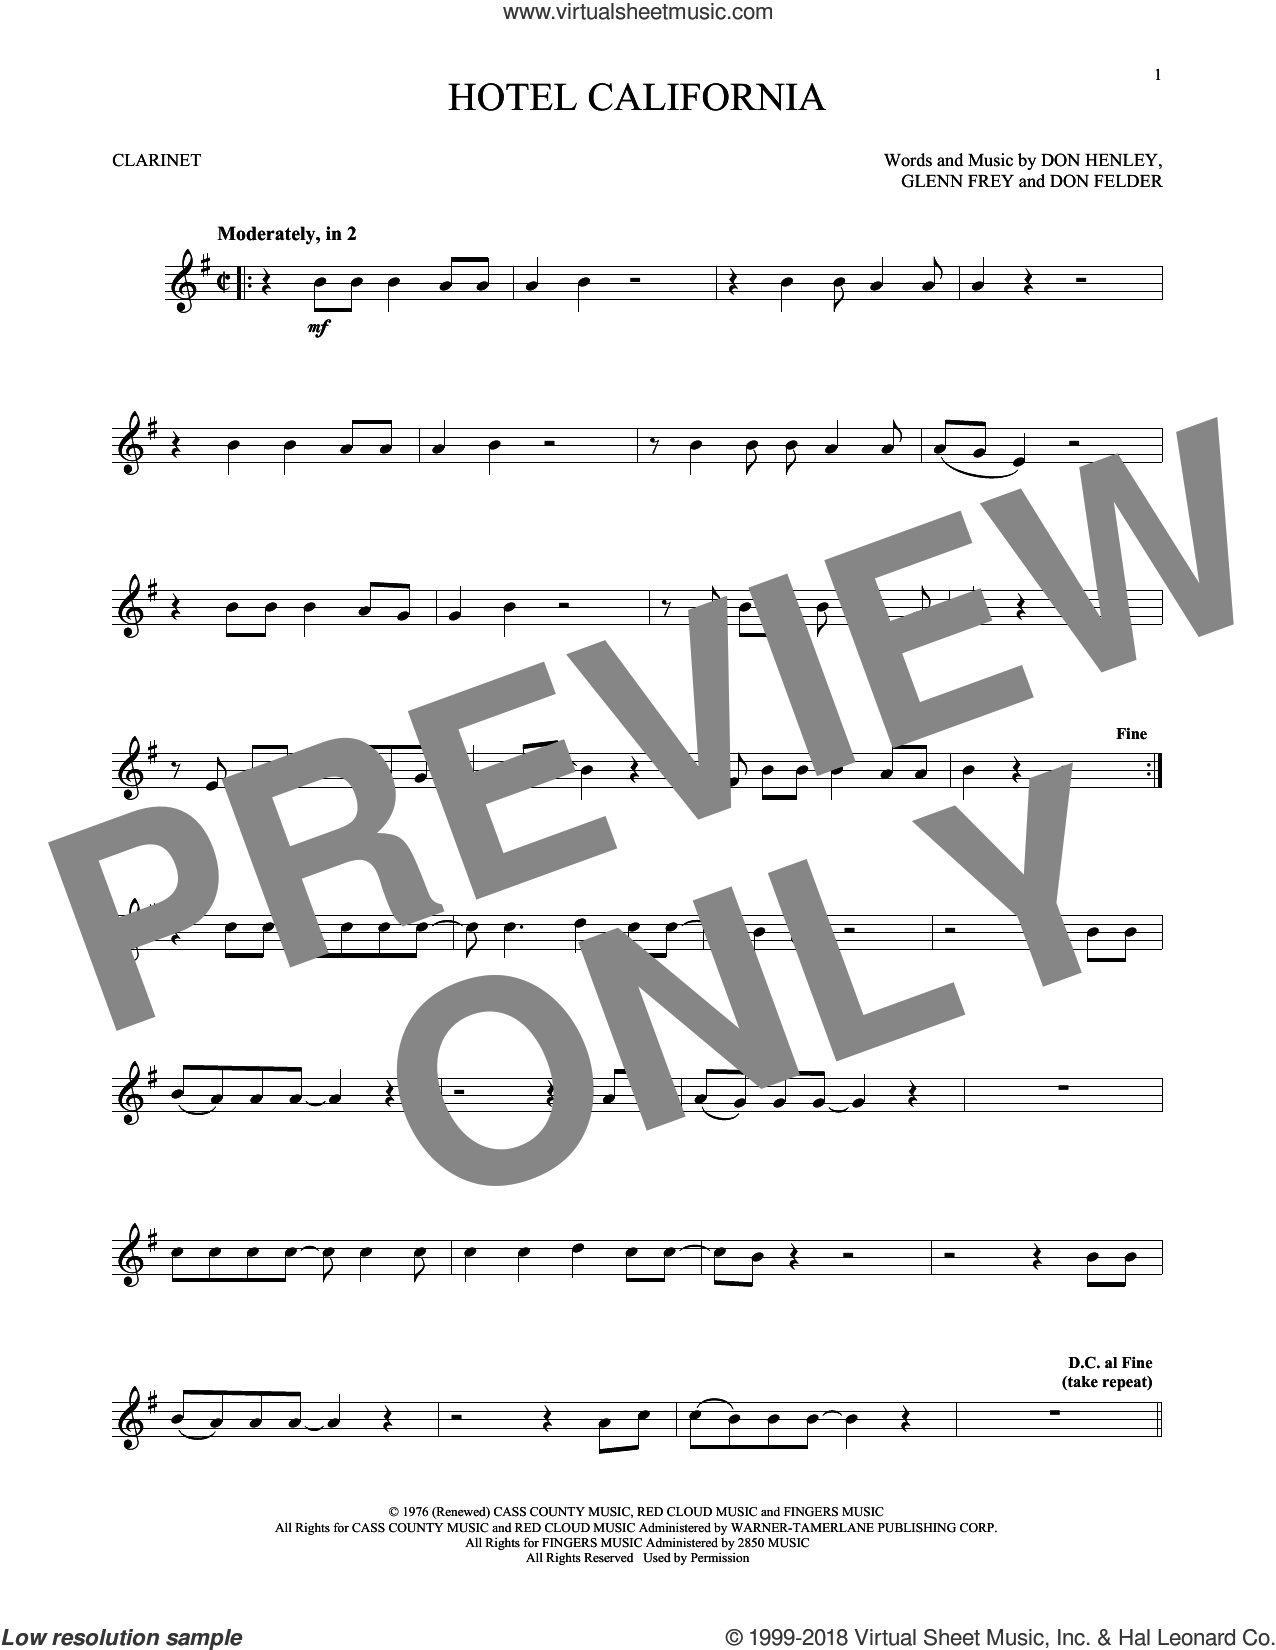 Hotel California sheet music for clarinet solo by Don Henley, The Eagles, Don Felder and Glenn Frey, intermediate skill level